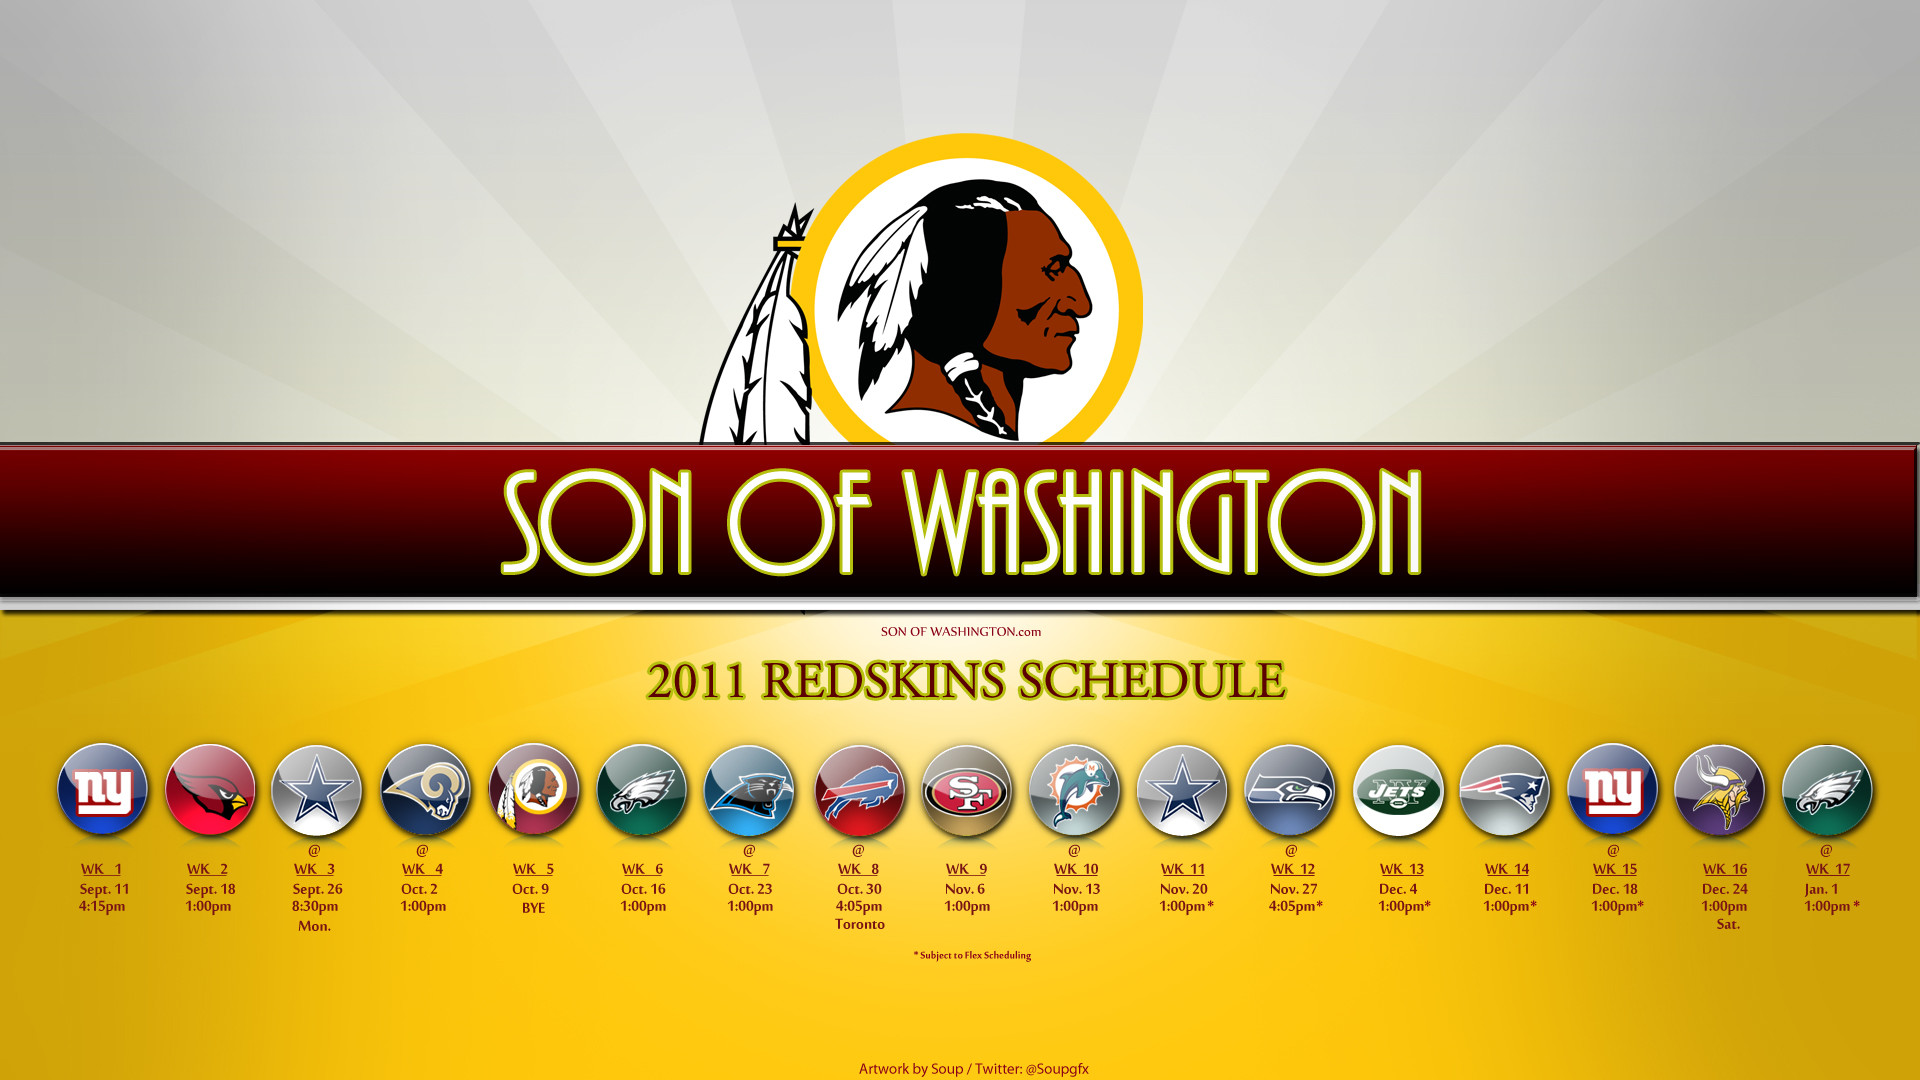 Free Washington Redskins Wallpapers (40 Wallpapers) – Adorable Wallpapers